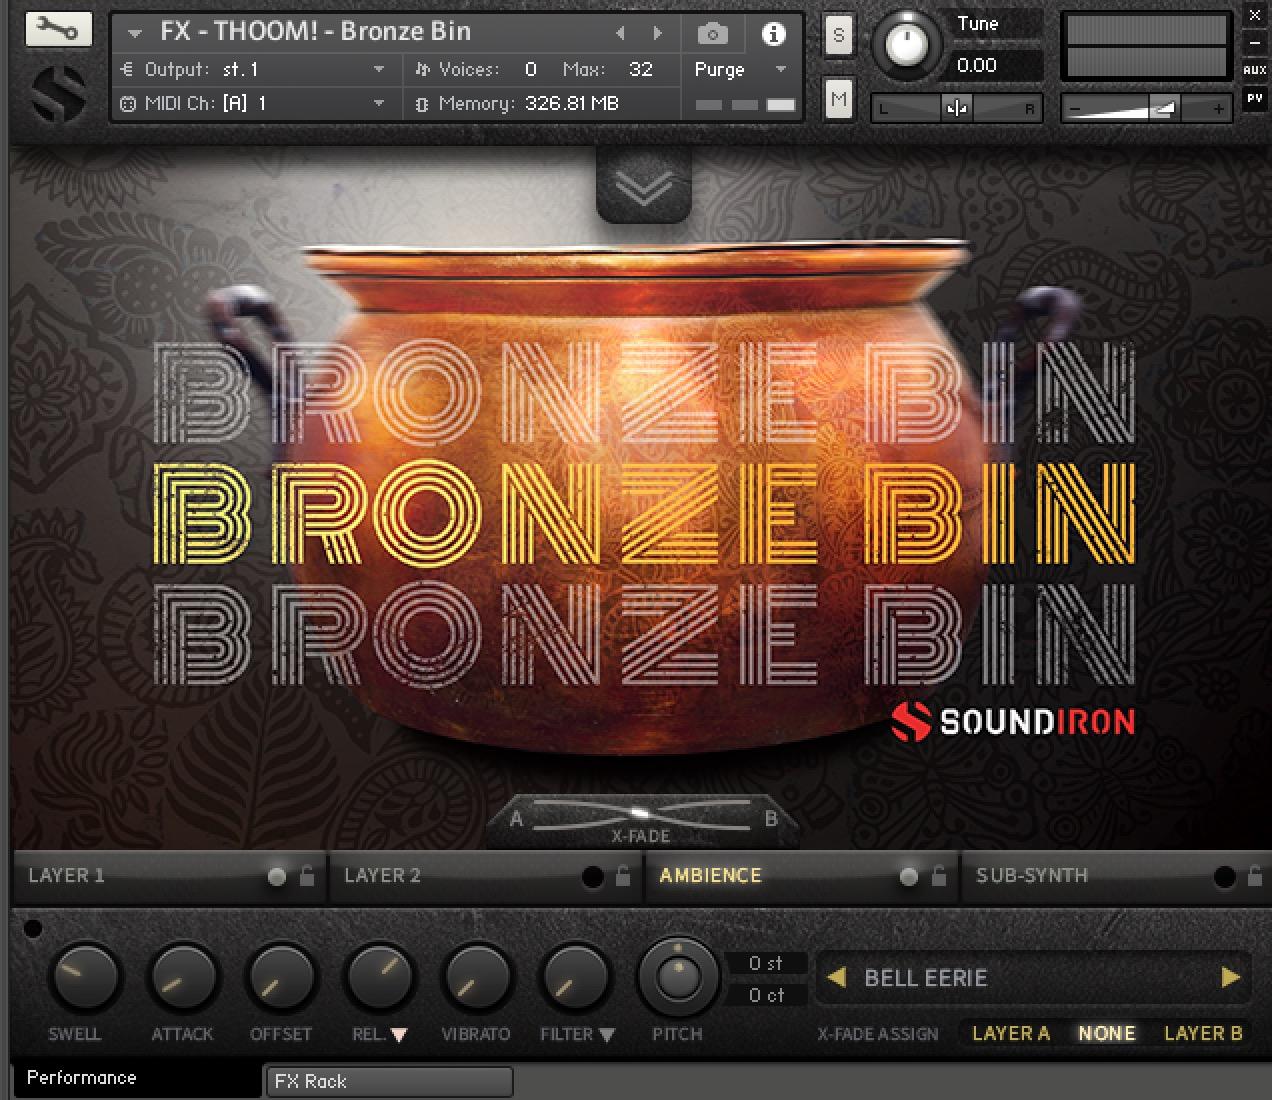 Soundiron did upgrade their classic Kontakt Library: Bronze Bin 3 0